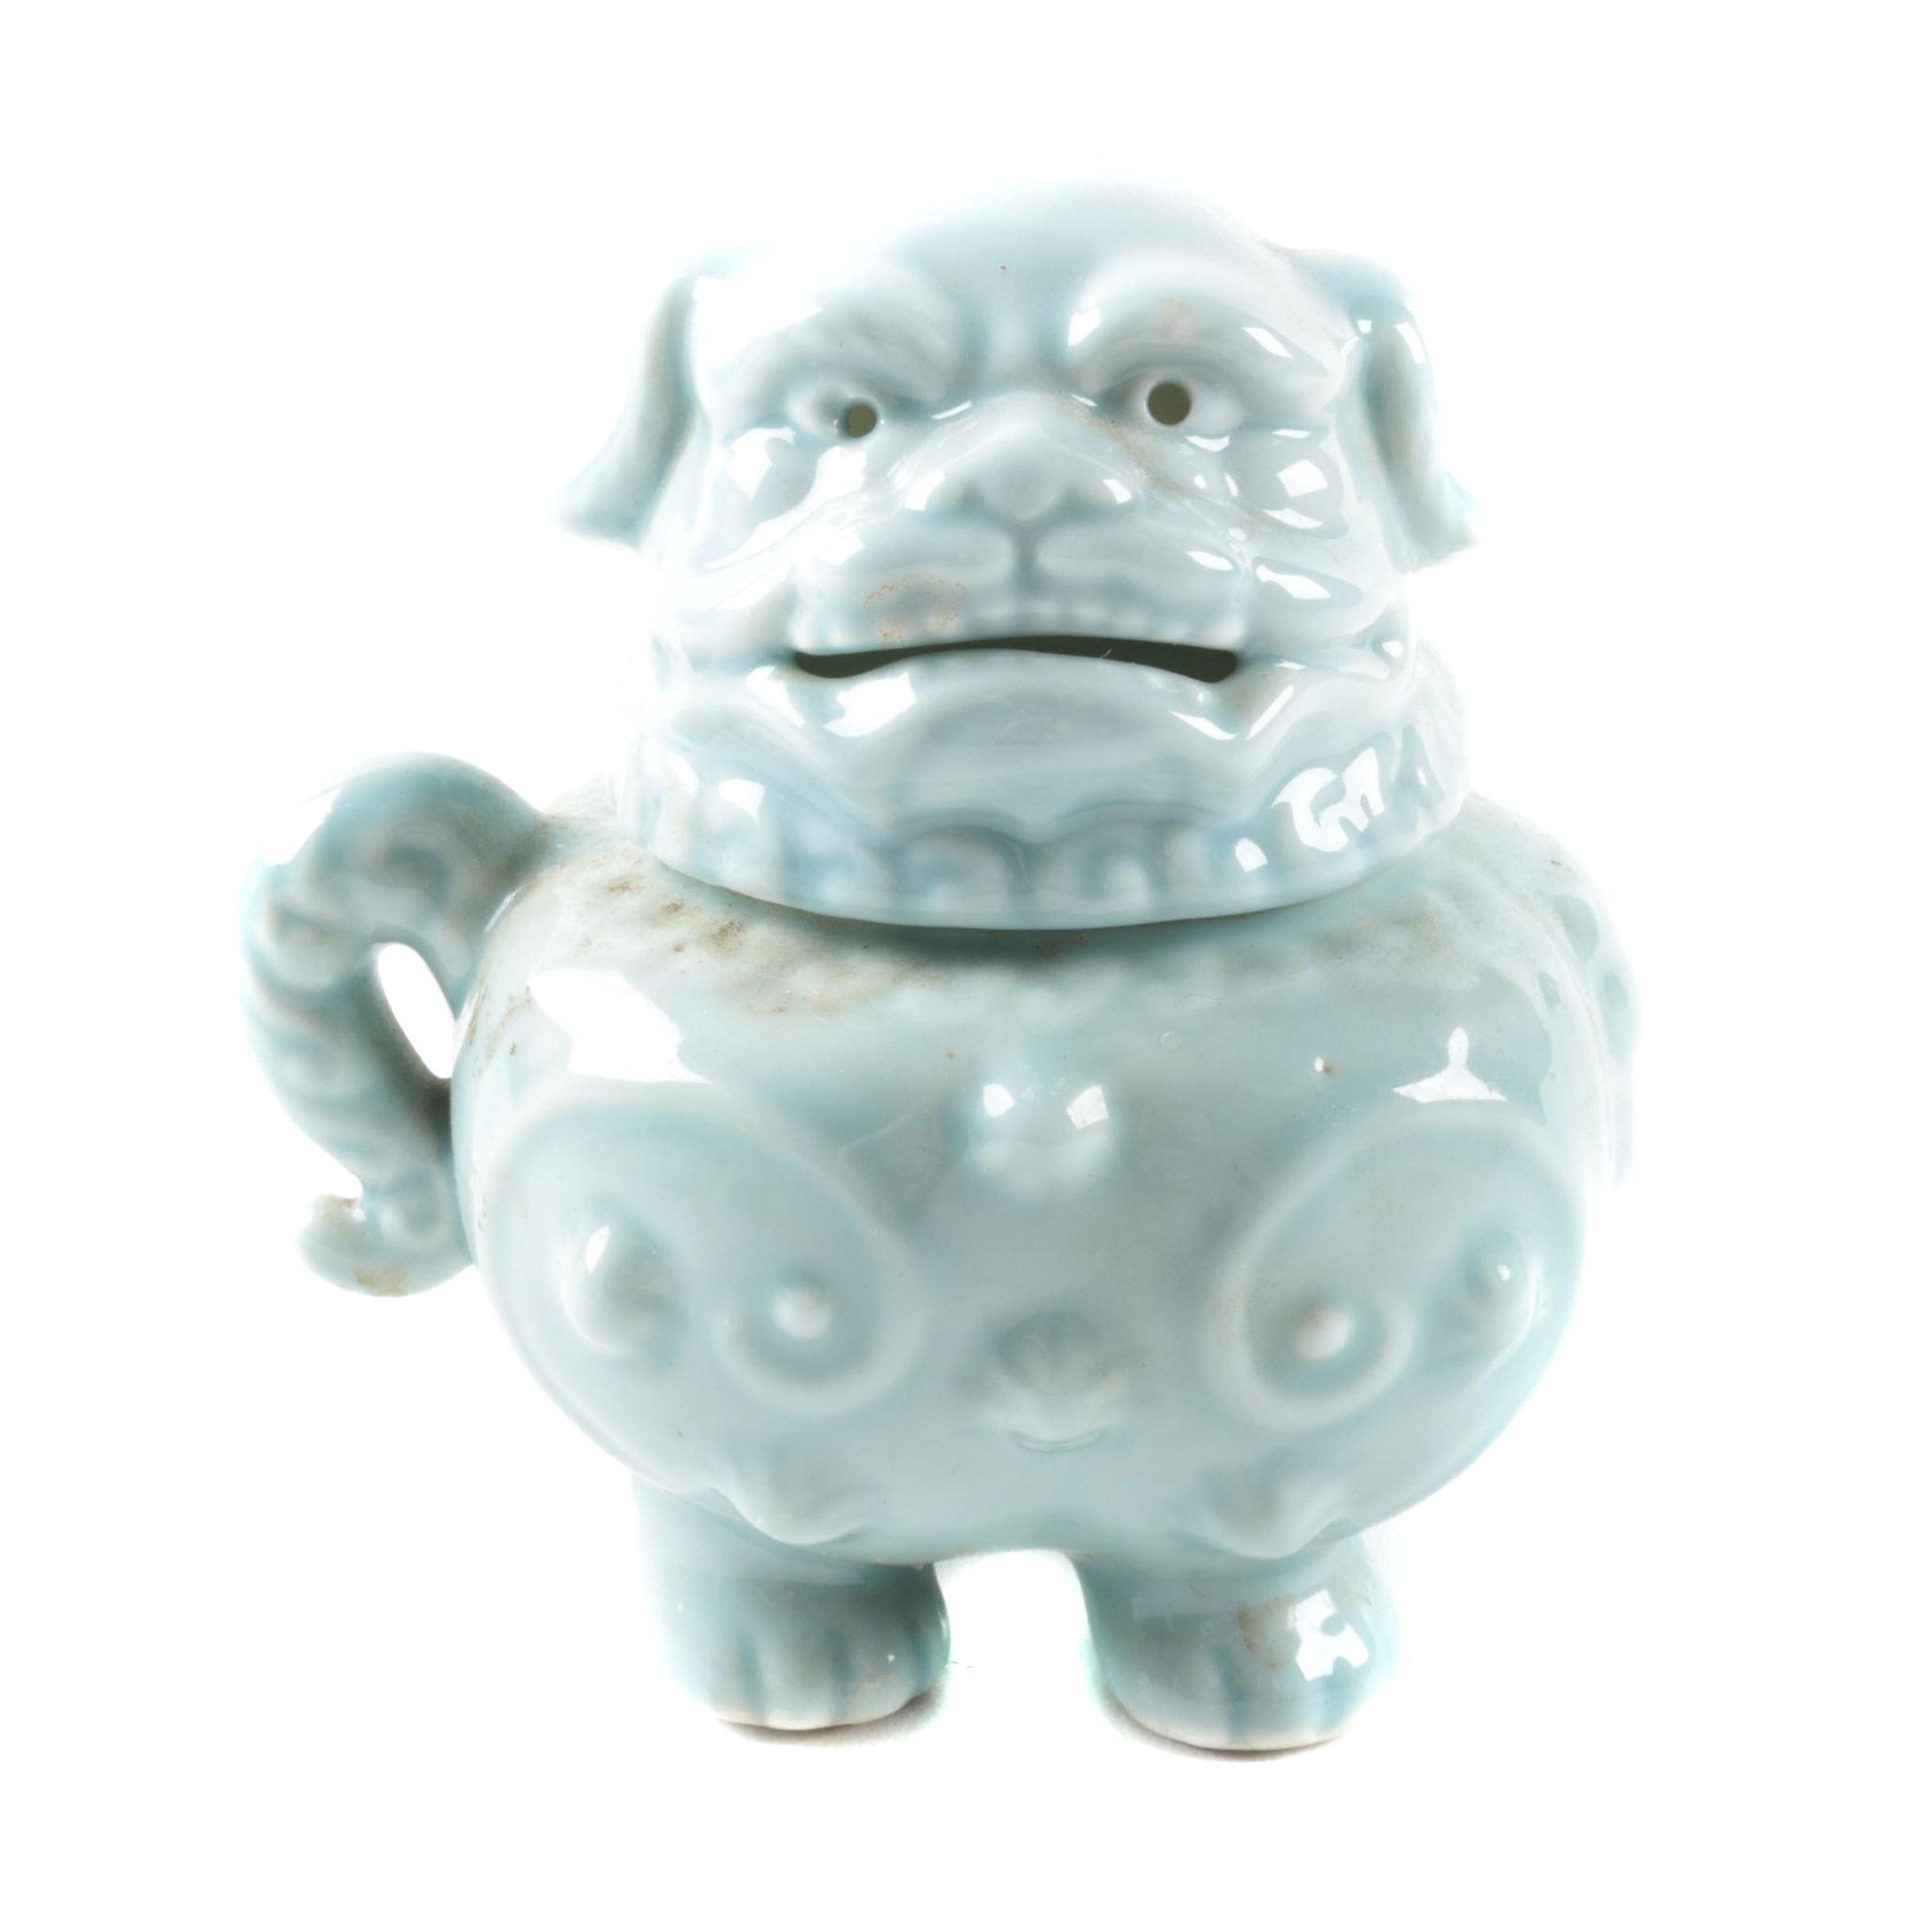 Ceramic Guardian Lion Lidded Jug